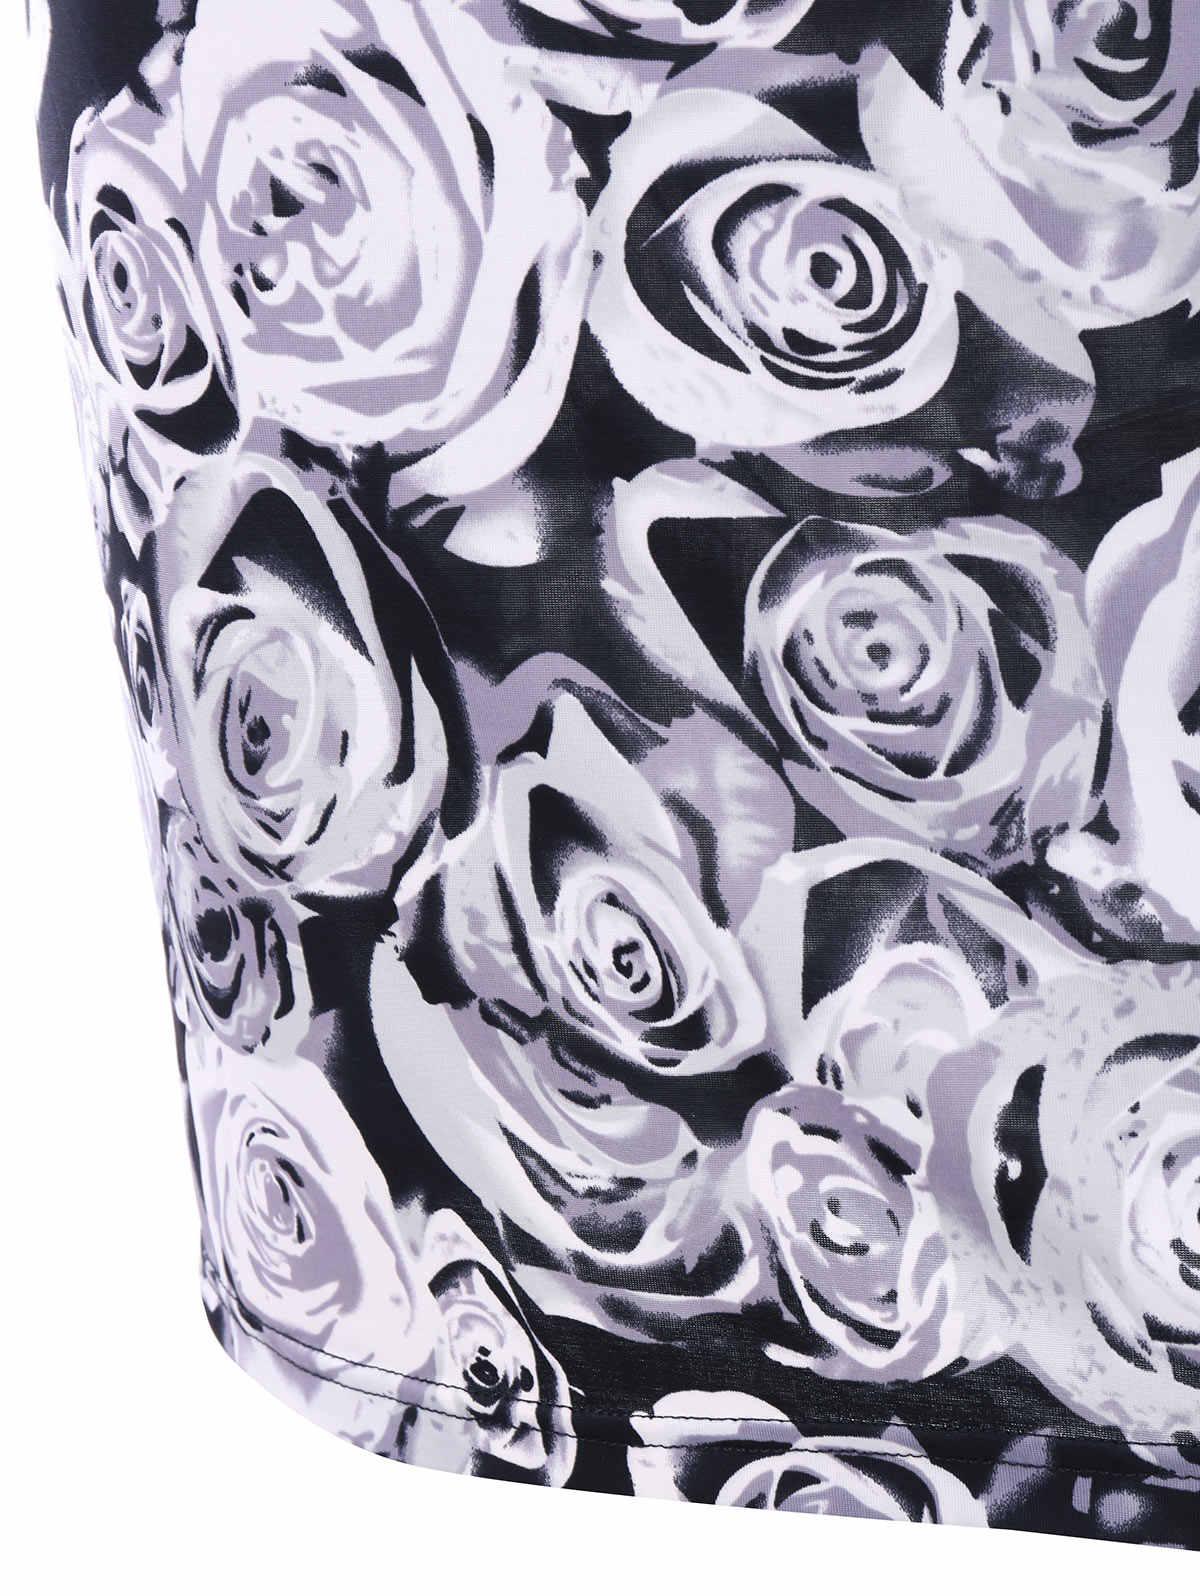 ebf3fa4f65 Gamiss Plus Size Dress Summer Rhinestone Embellished Glittery Scalloped  Capelet Bodycon Dress Women OL Pencil Dresses Vestidos